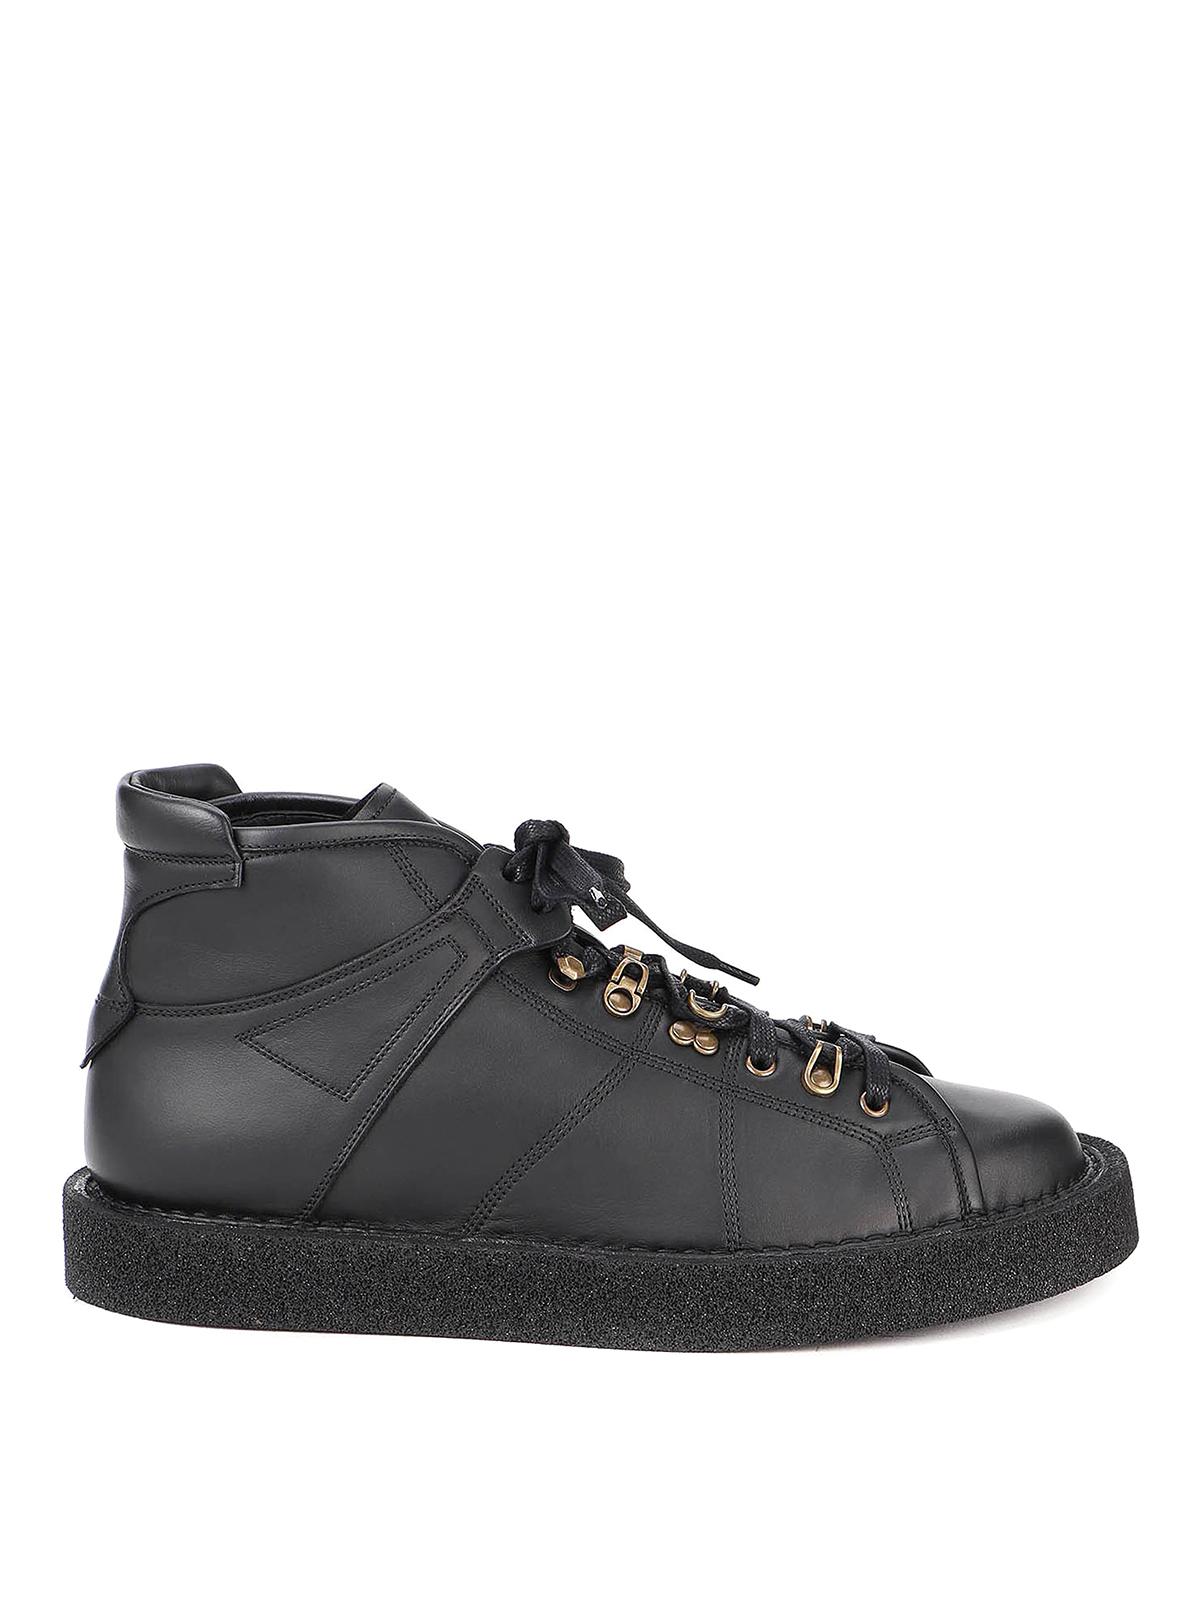 Dolce & Gabbana Leathers MODIGLIANI ANKLE BOOTS